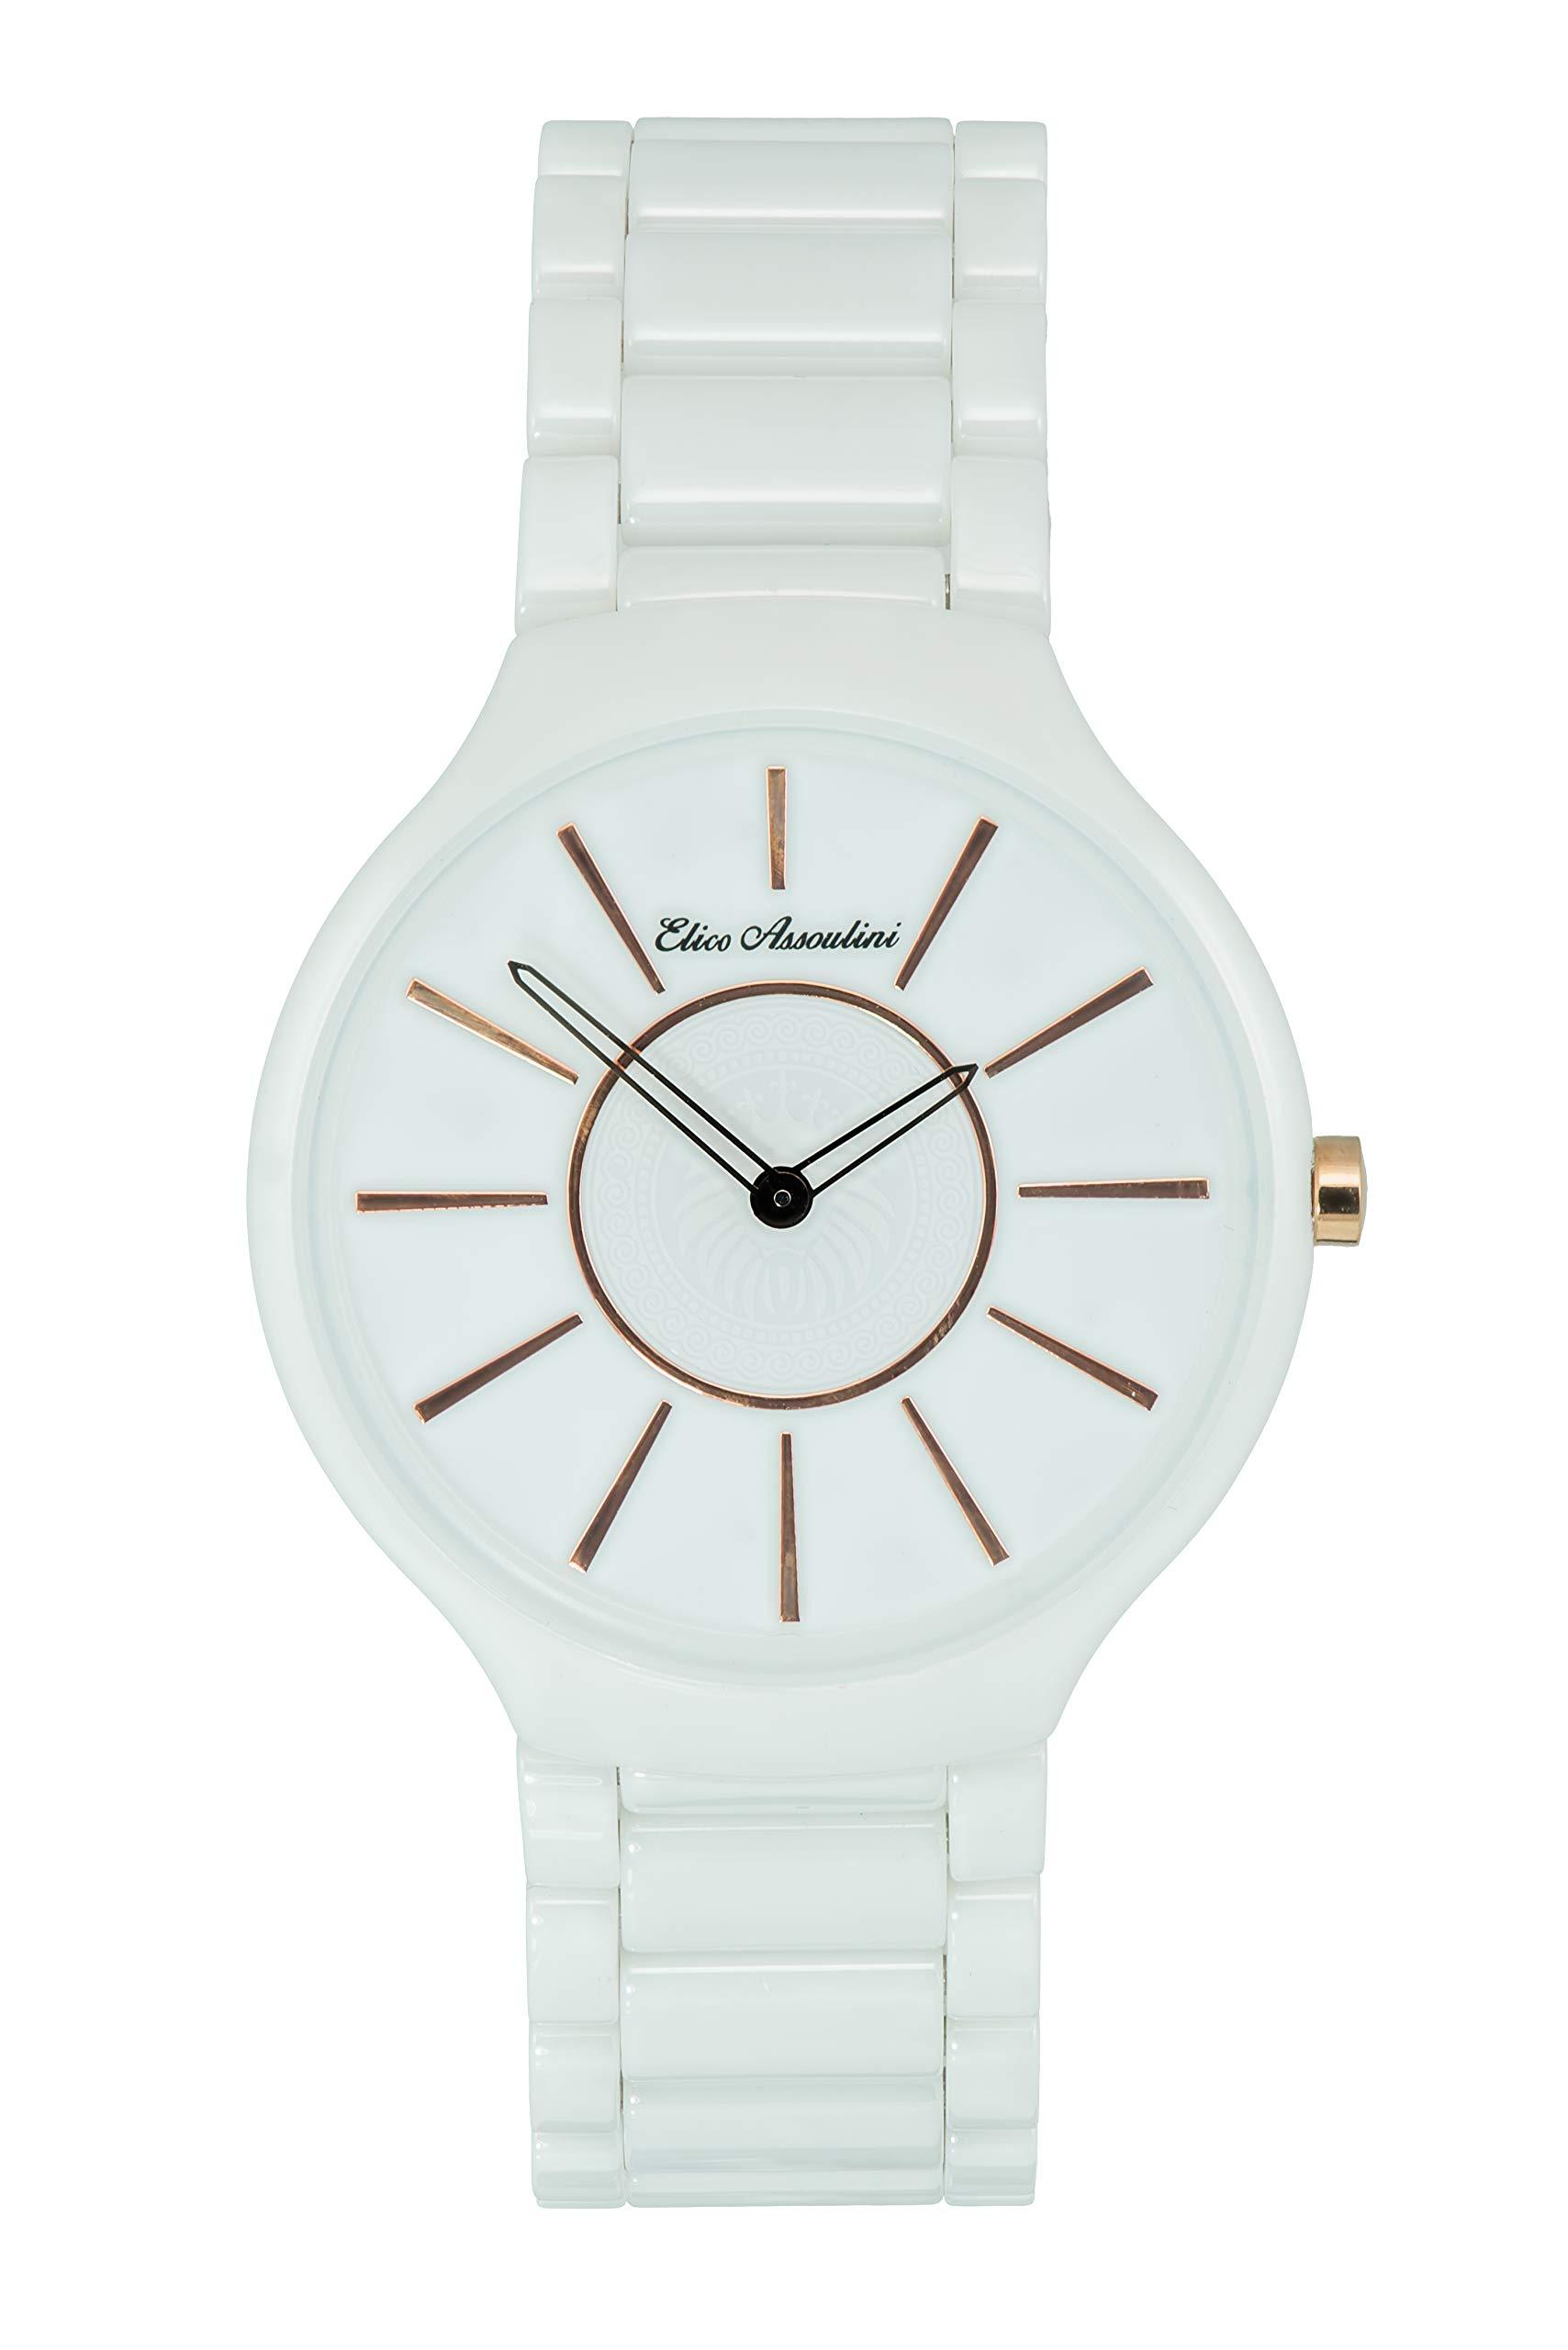 Elico Assoulini Baby Boy's SL75968''Leone'' Ceramic Watch, White by Elico Assoulini